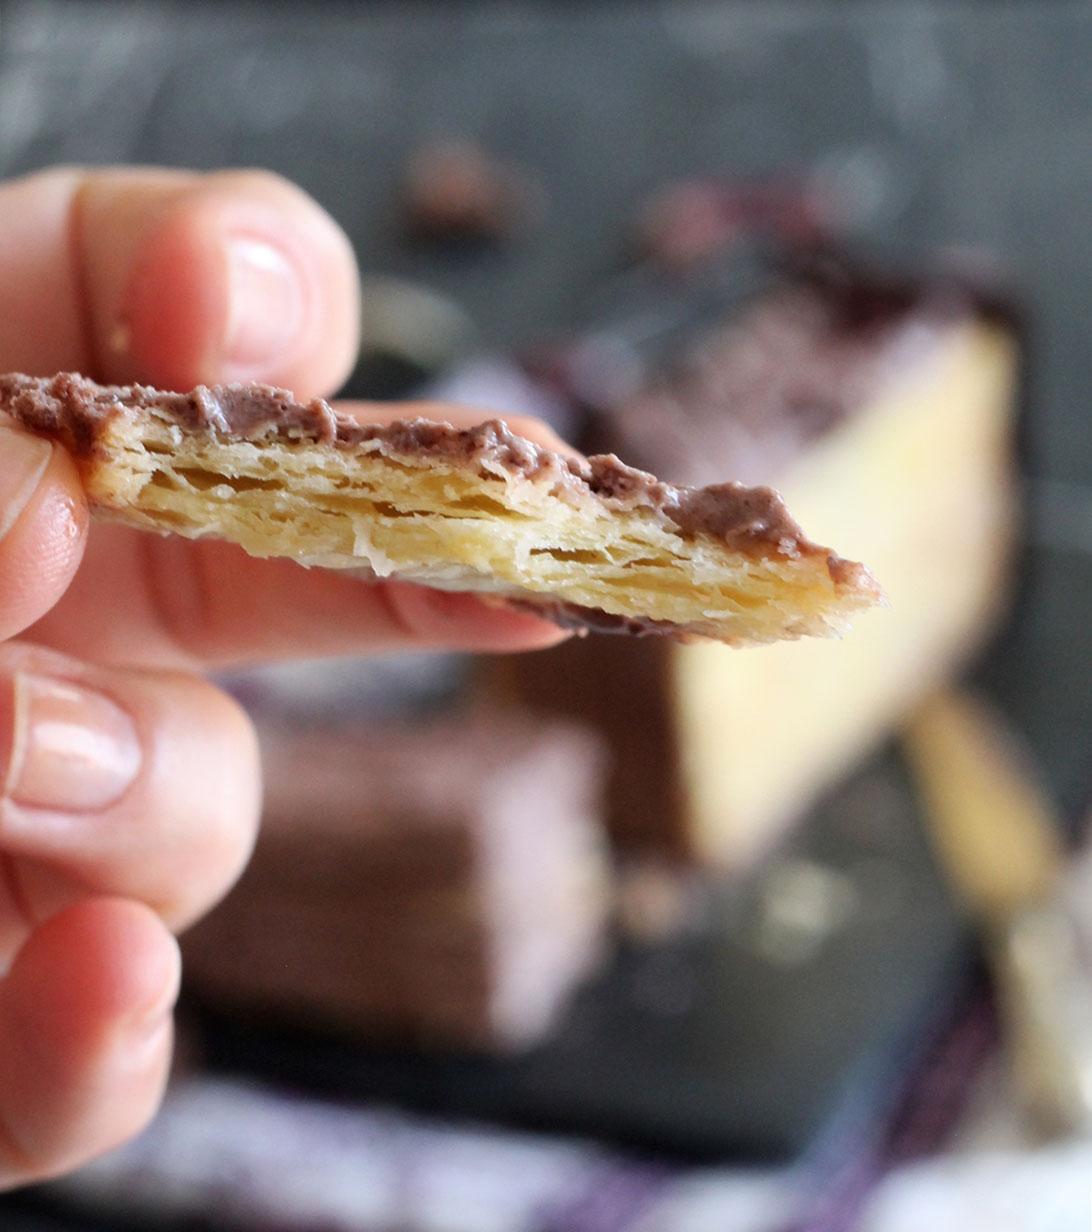 Millefoglie senza glutine al cacao - La Cassata Celiaca